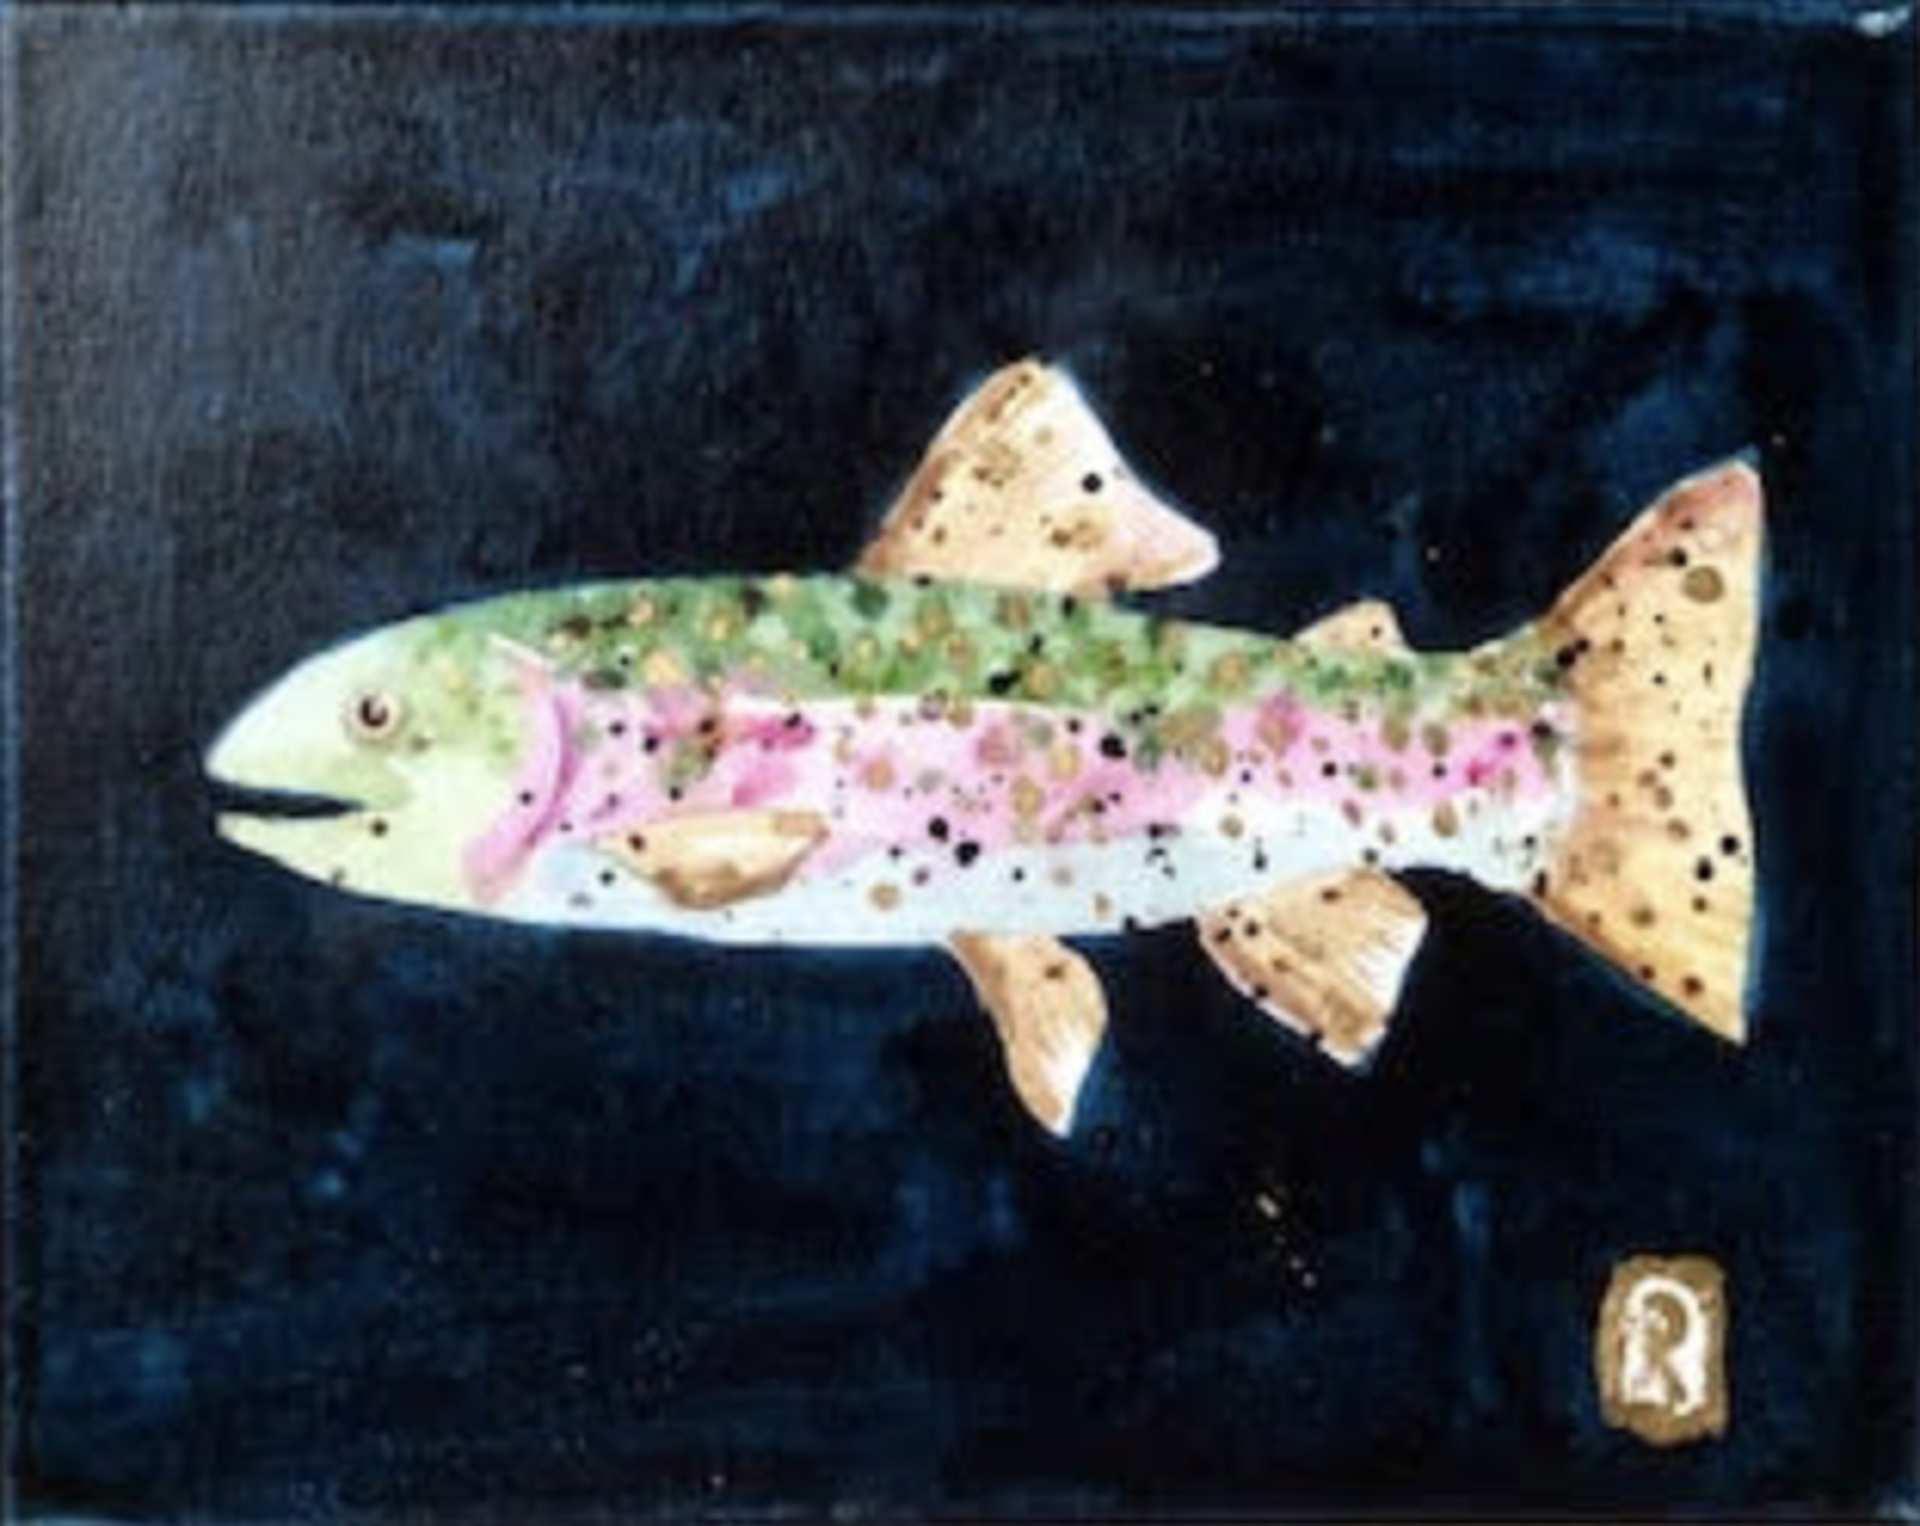 Indigo Small Fry II by Laura Roebuck